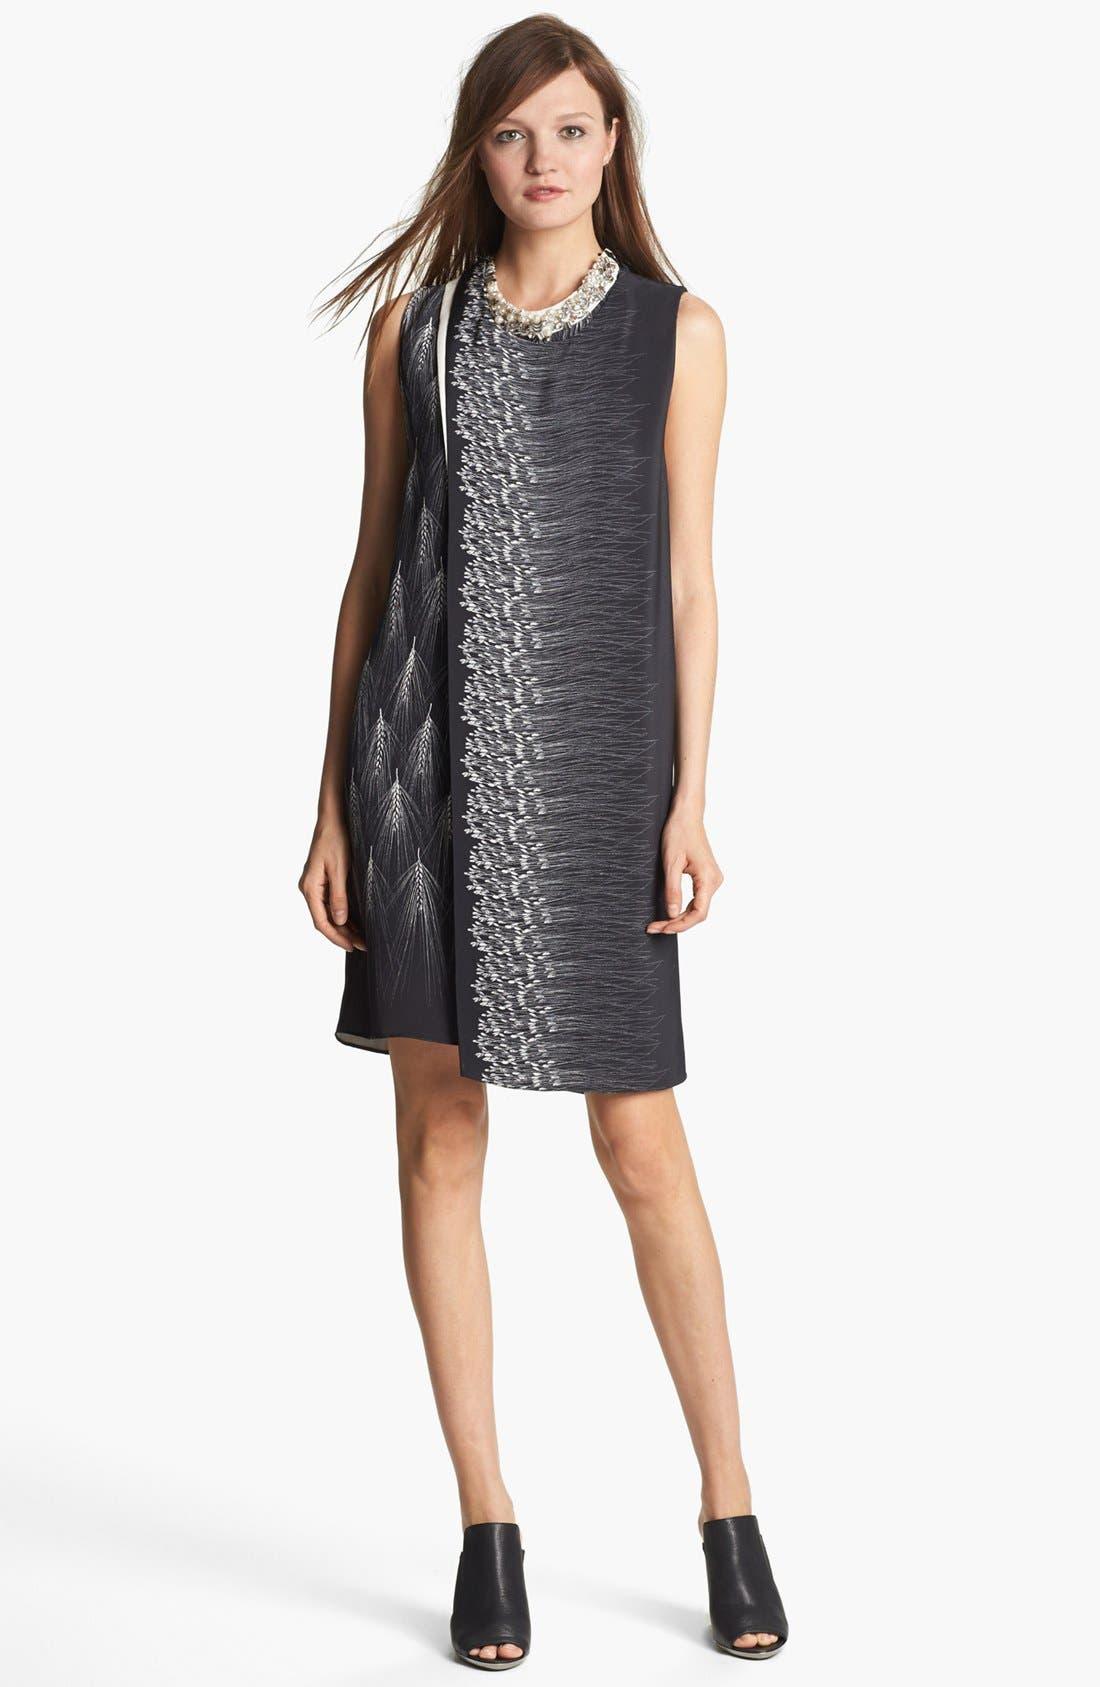 Main Image - 3.1 Phillip Lim Mix Print Layered Silk Dress